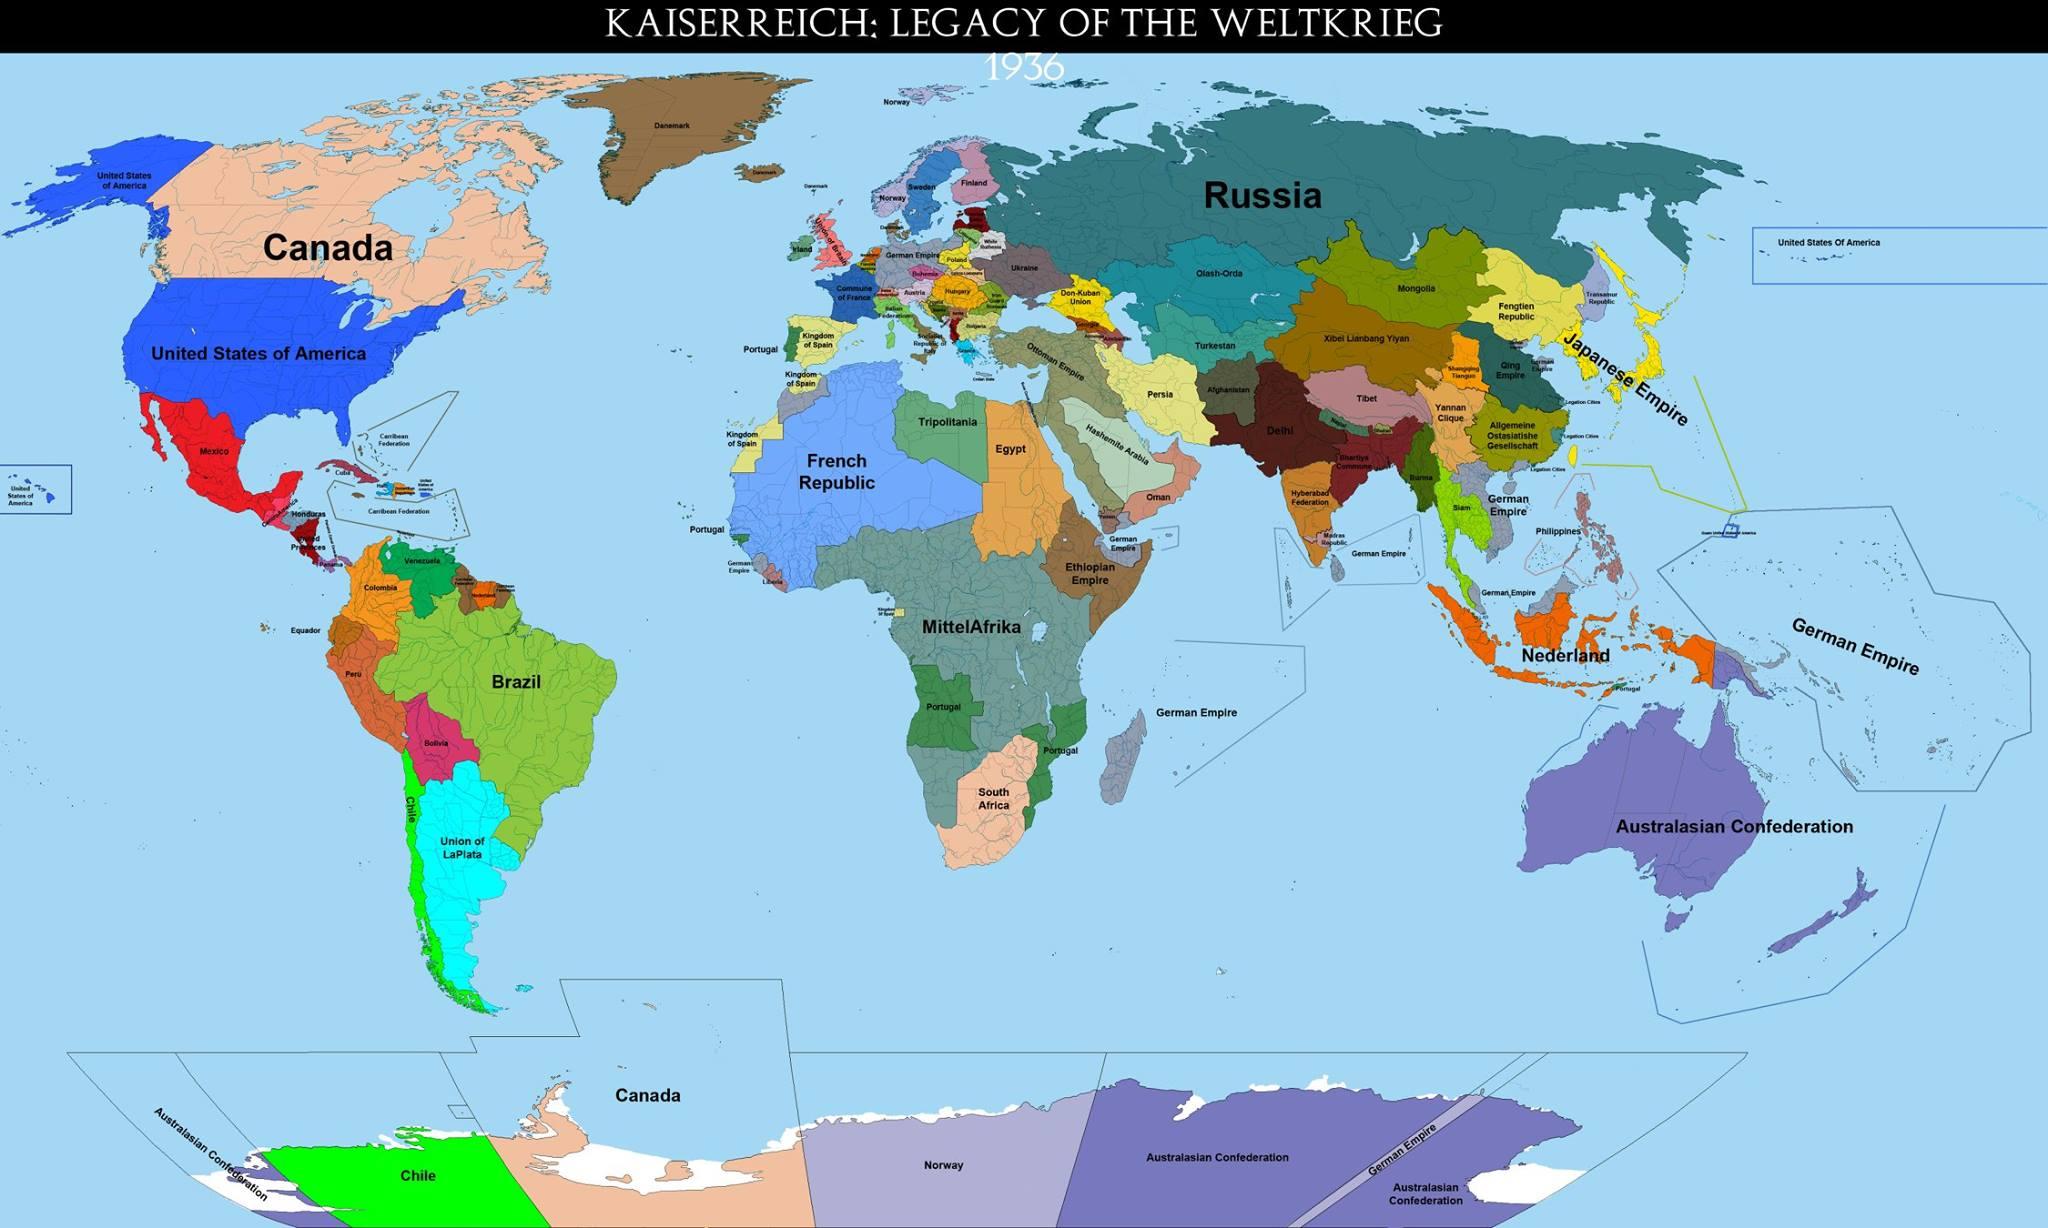 Hoi4 Kaiserreich Province Map